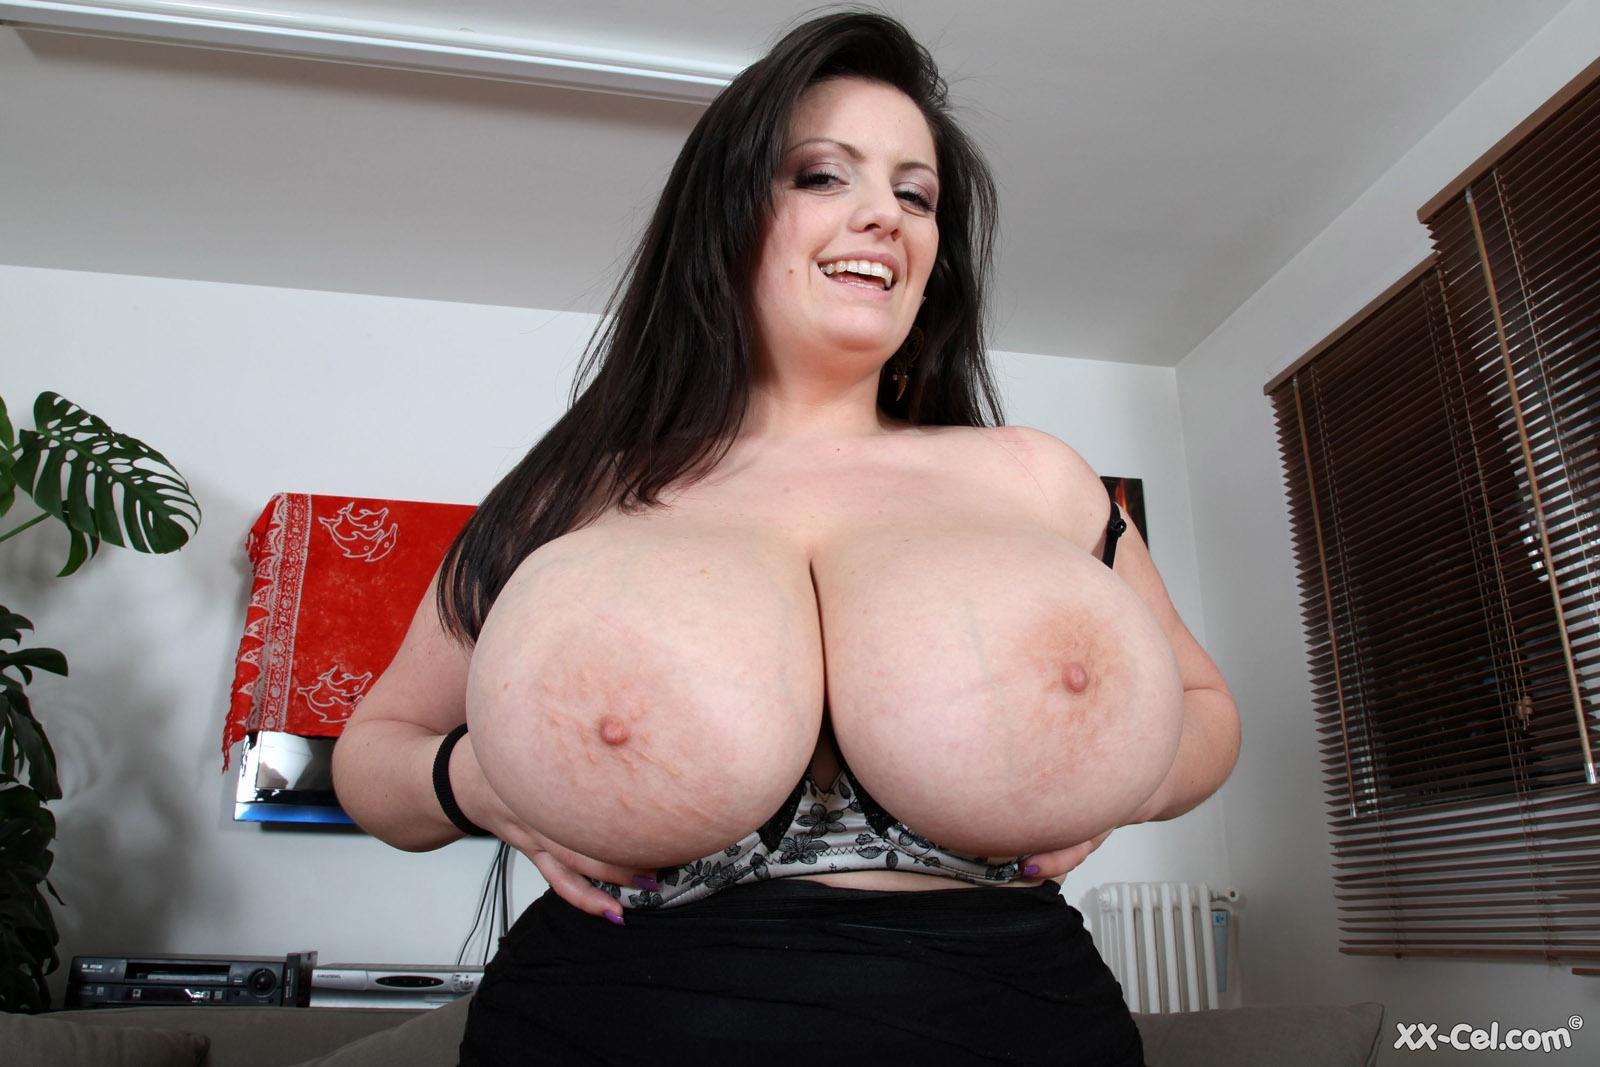 Nude sex big tits photos mamta kulkarni